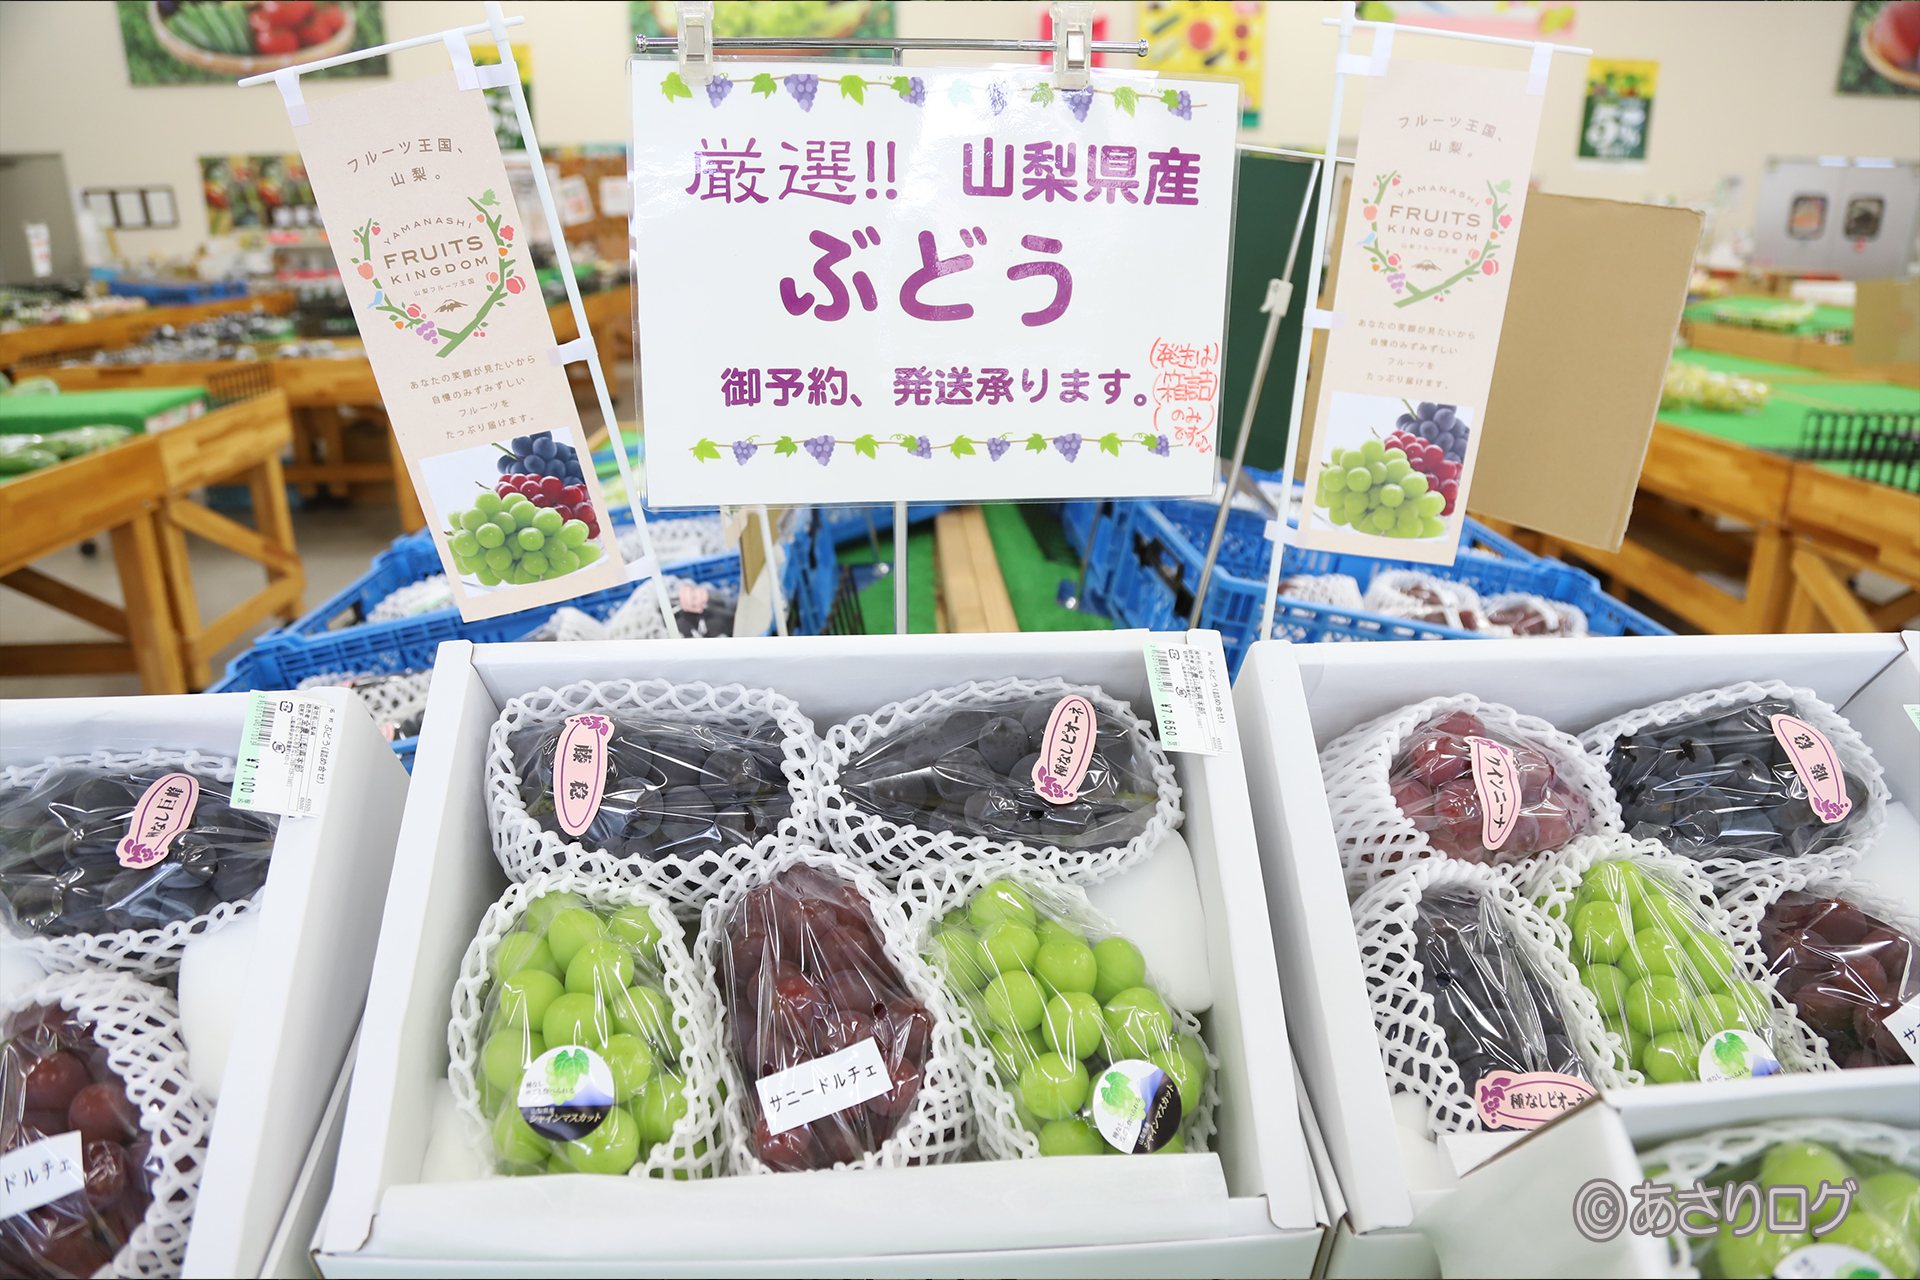 Gift grapes